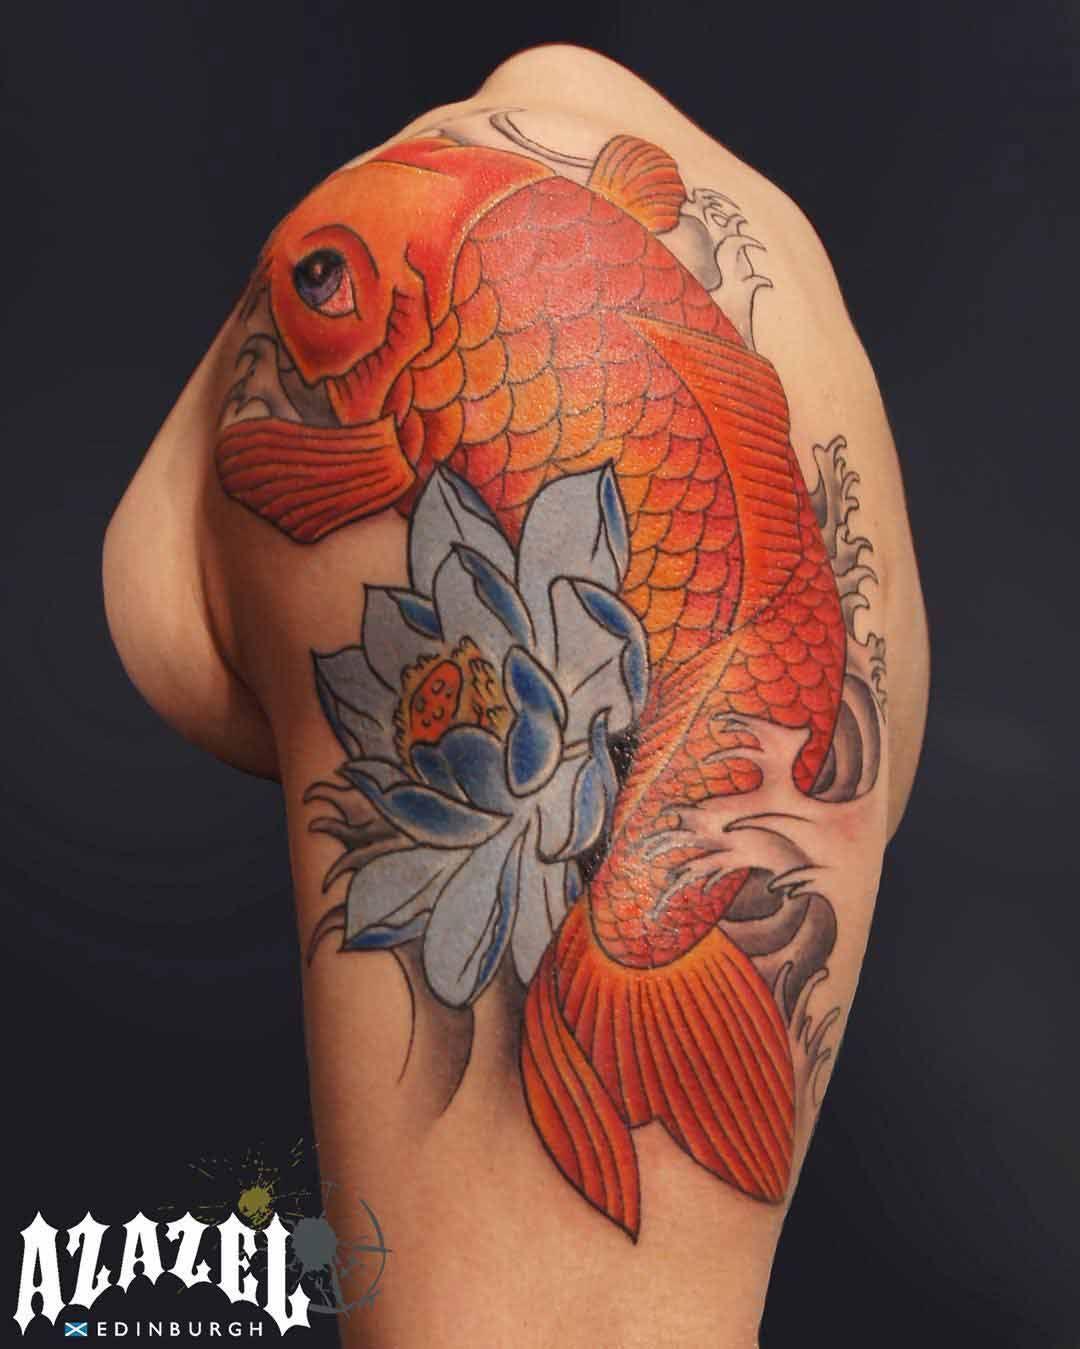 Traditional Japanese Koi Fish Tattoo | Tattoos | Pinterest ...